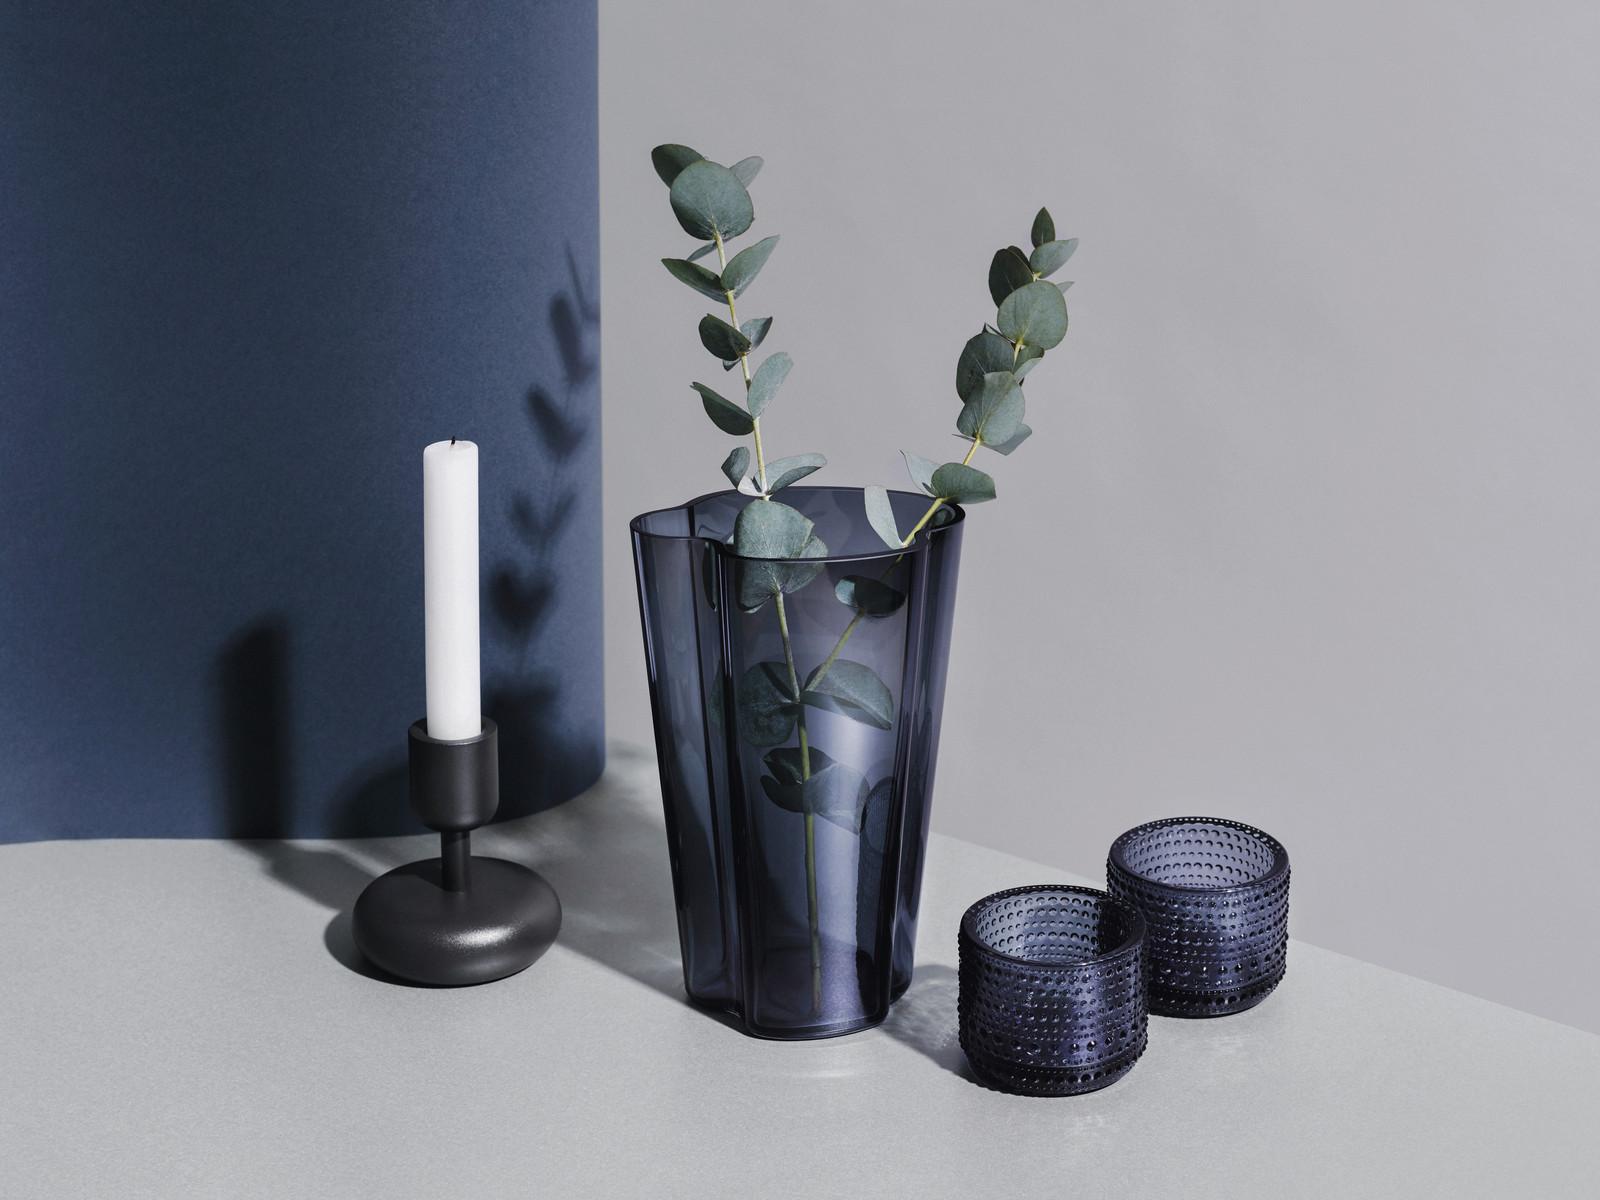 products jacksons savoy aalto vase alvar